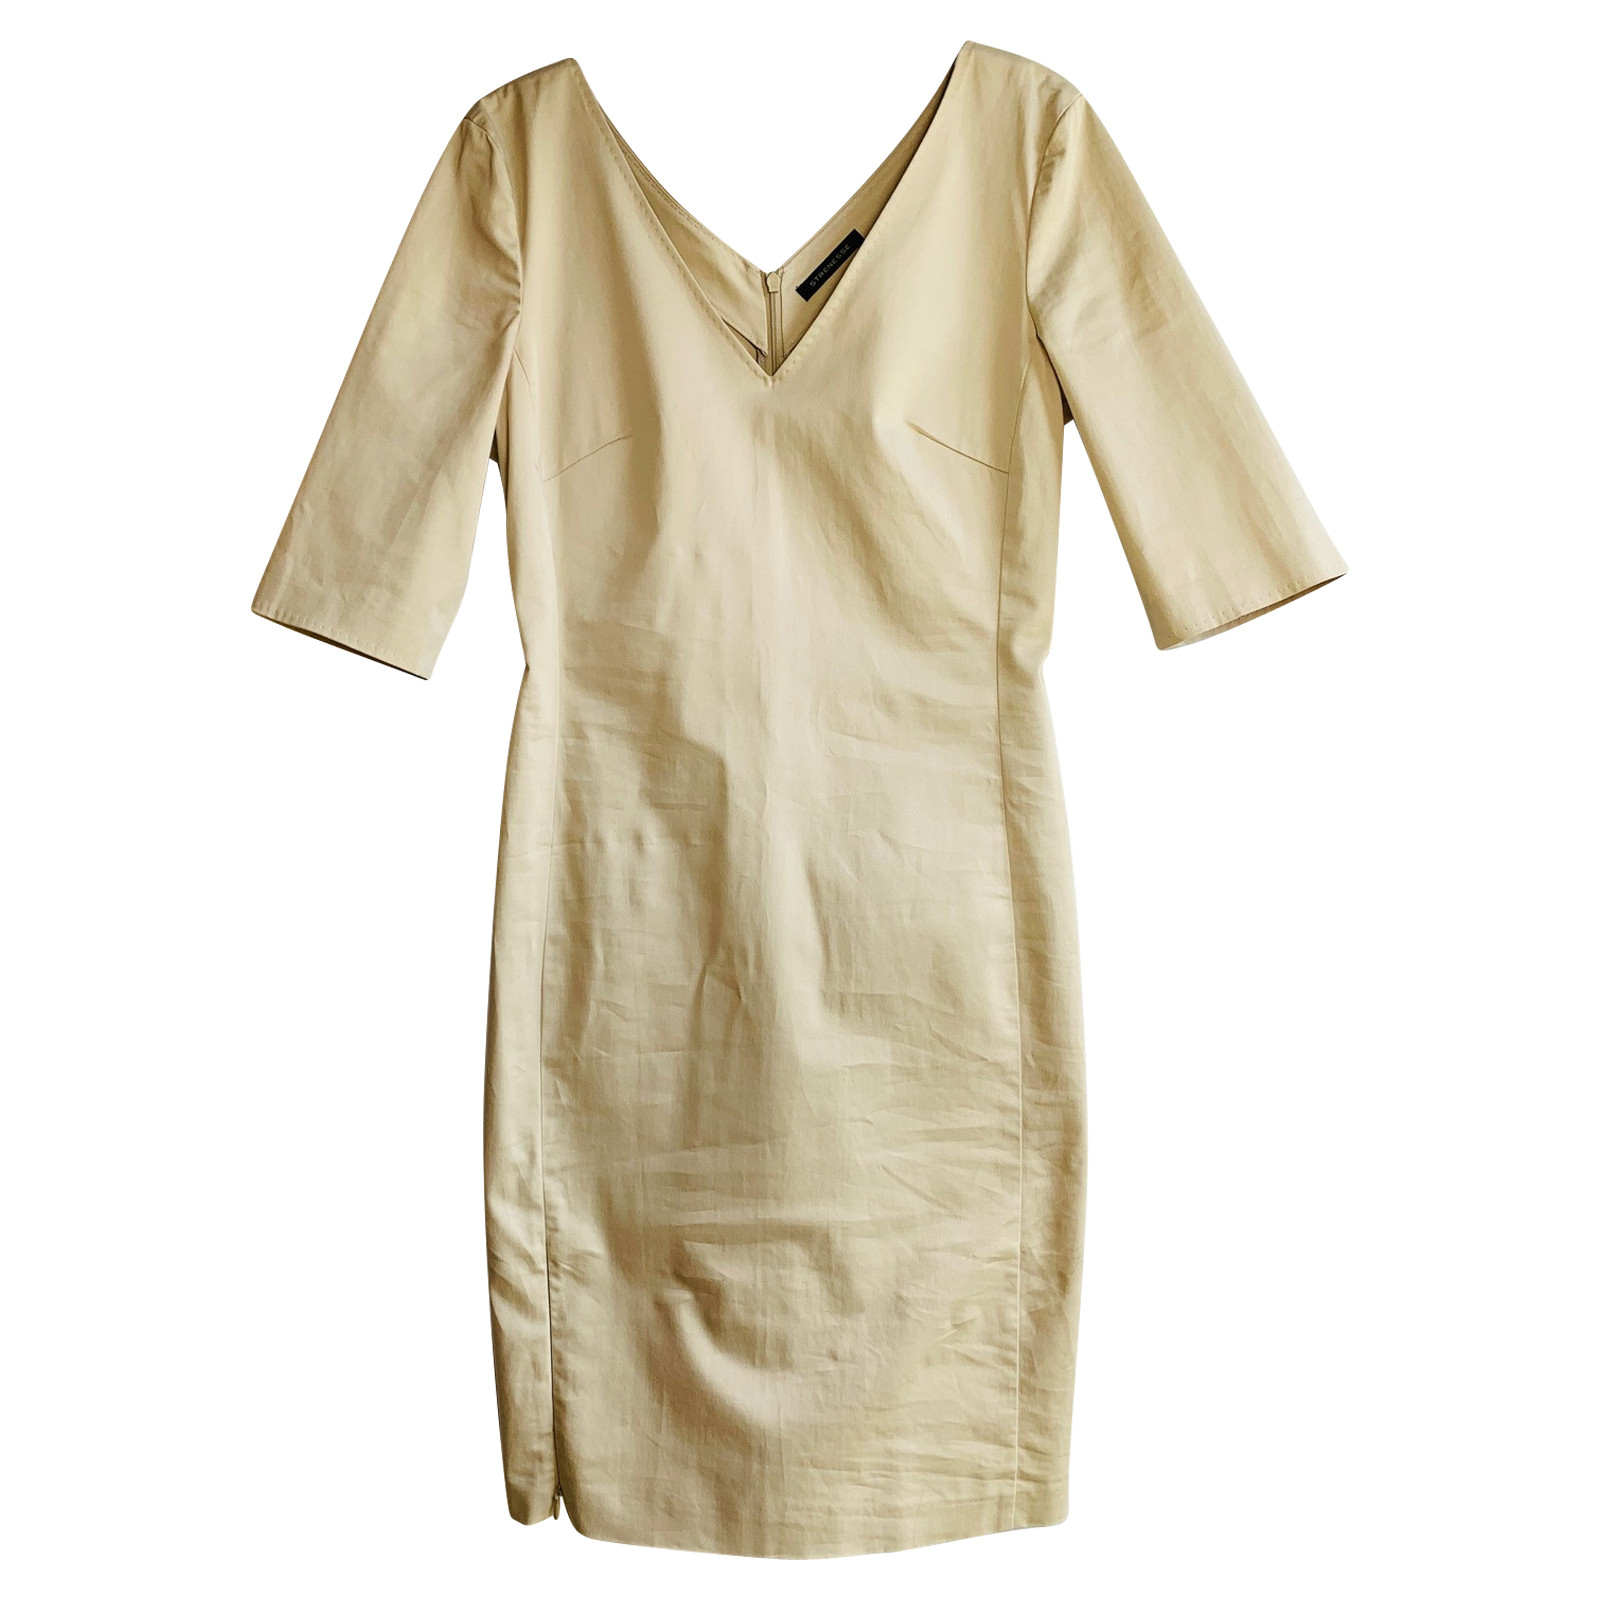 Strenesse Kleid aus Baumwolle in Beige - Second Hand Strenesse